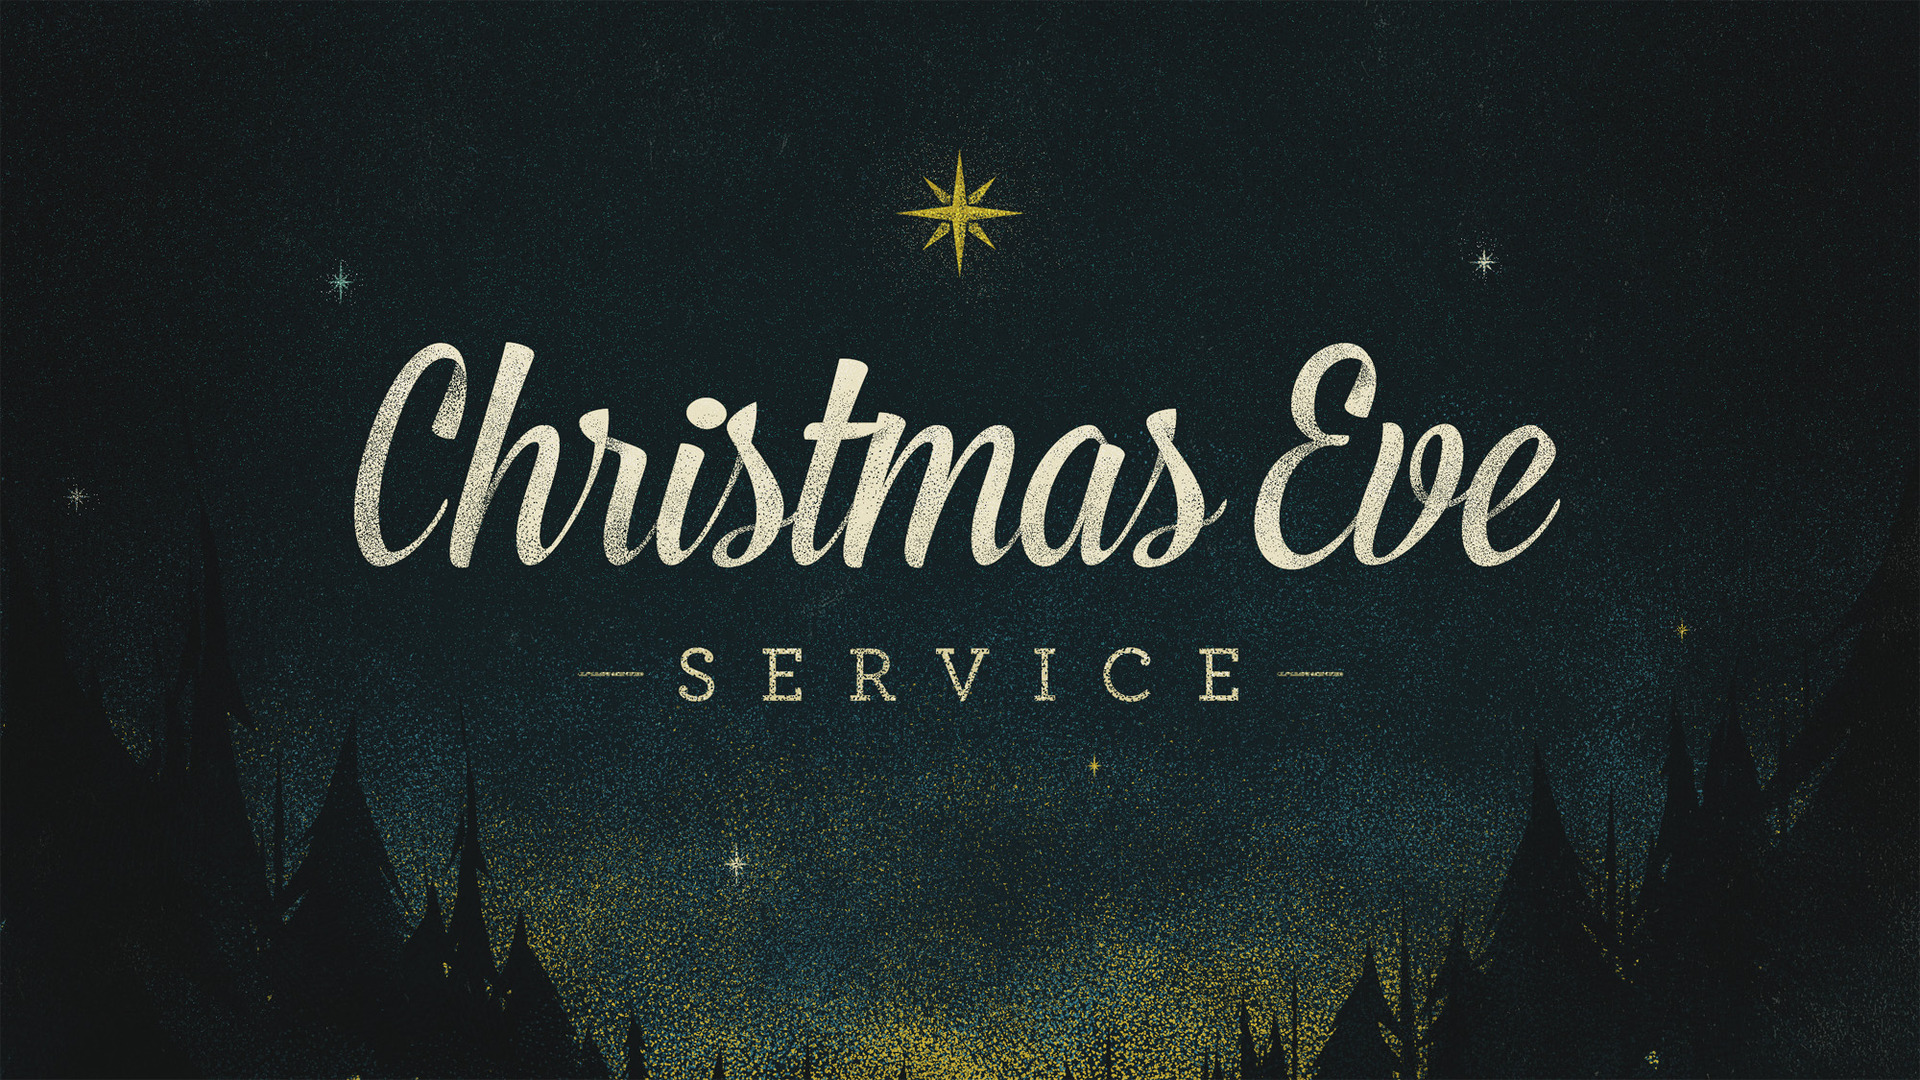 christmas_eve-title-1-still-16x9.jpg